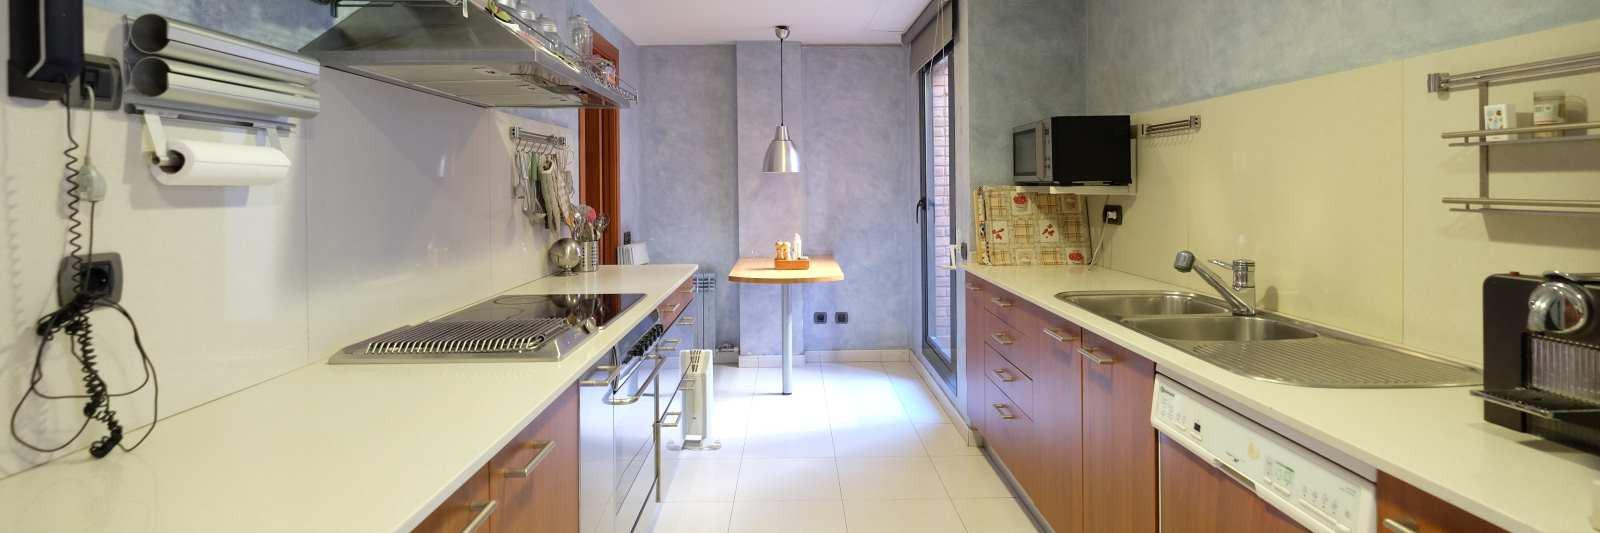 MG Inmobiliaria Barcelona - tres-torres-emancipacion